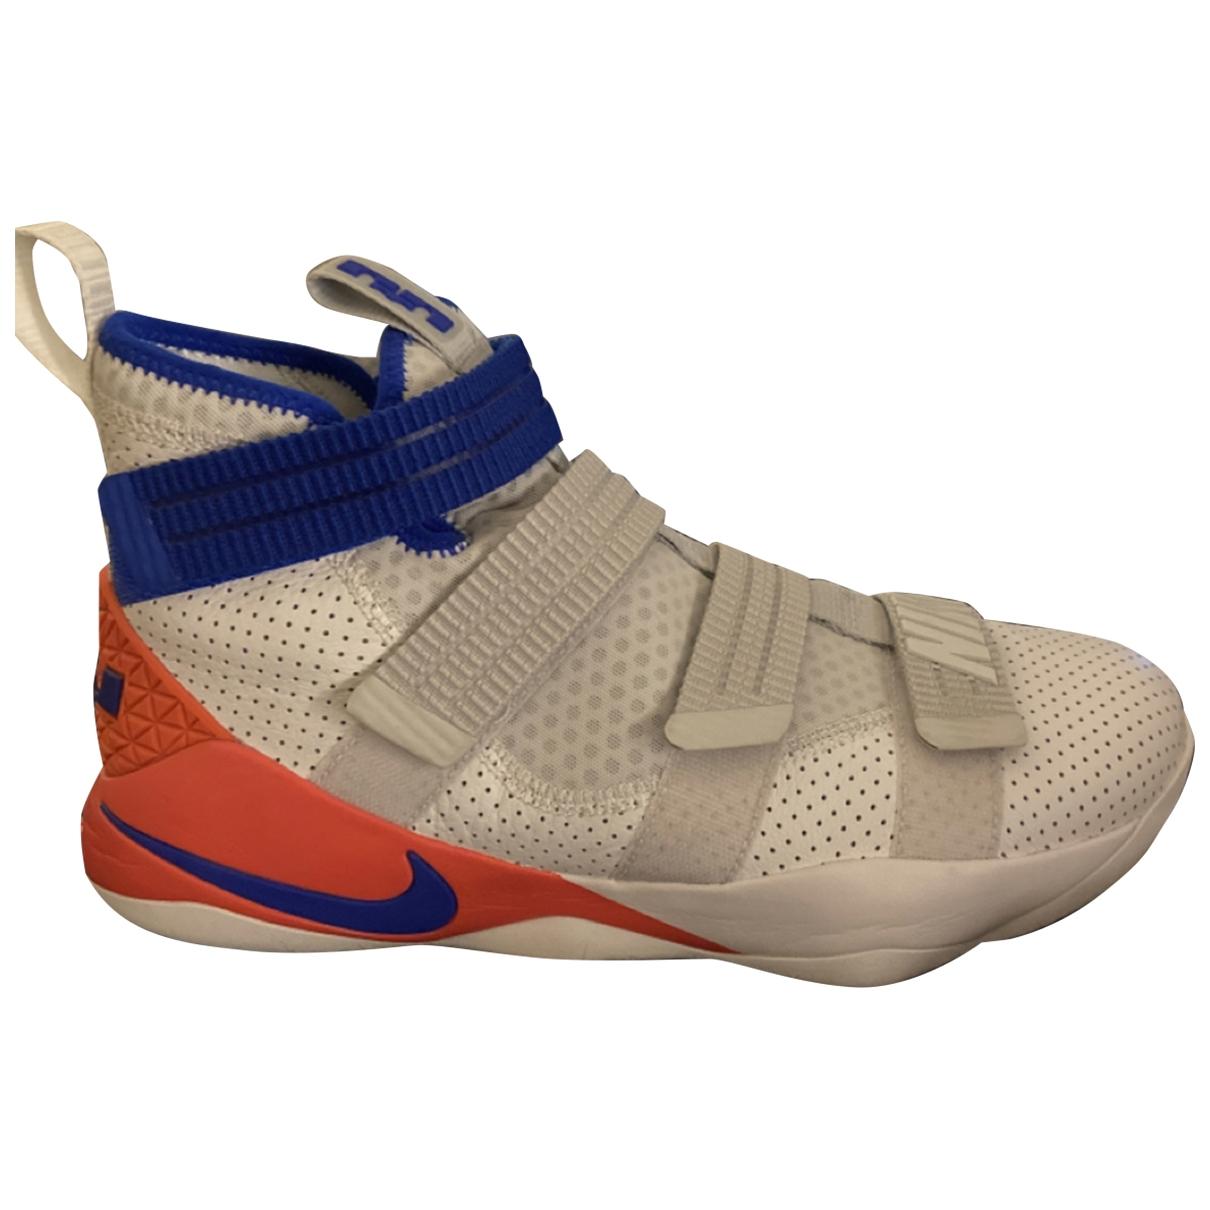 Nike Lebron X Kith - Baskets   pour homme en caoutchouc - blanc